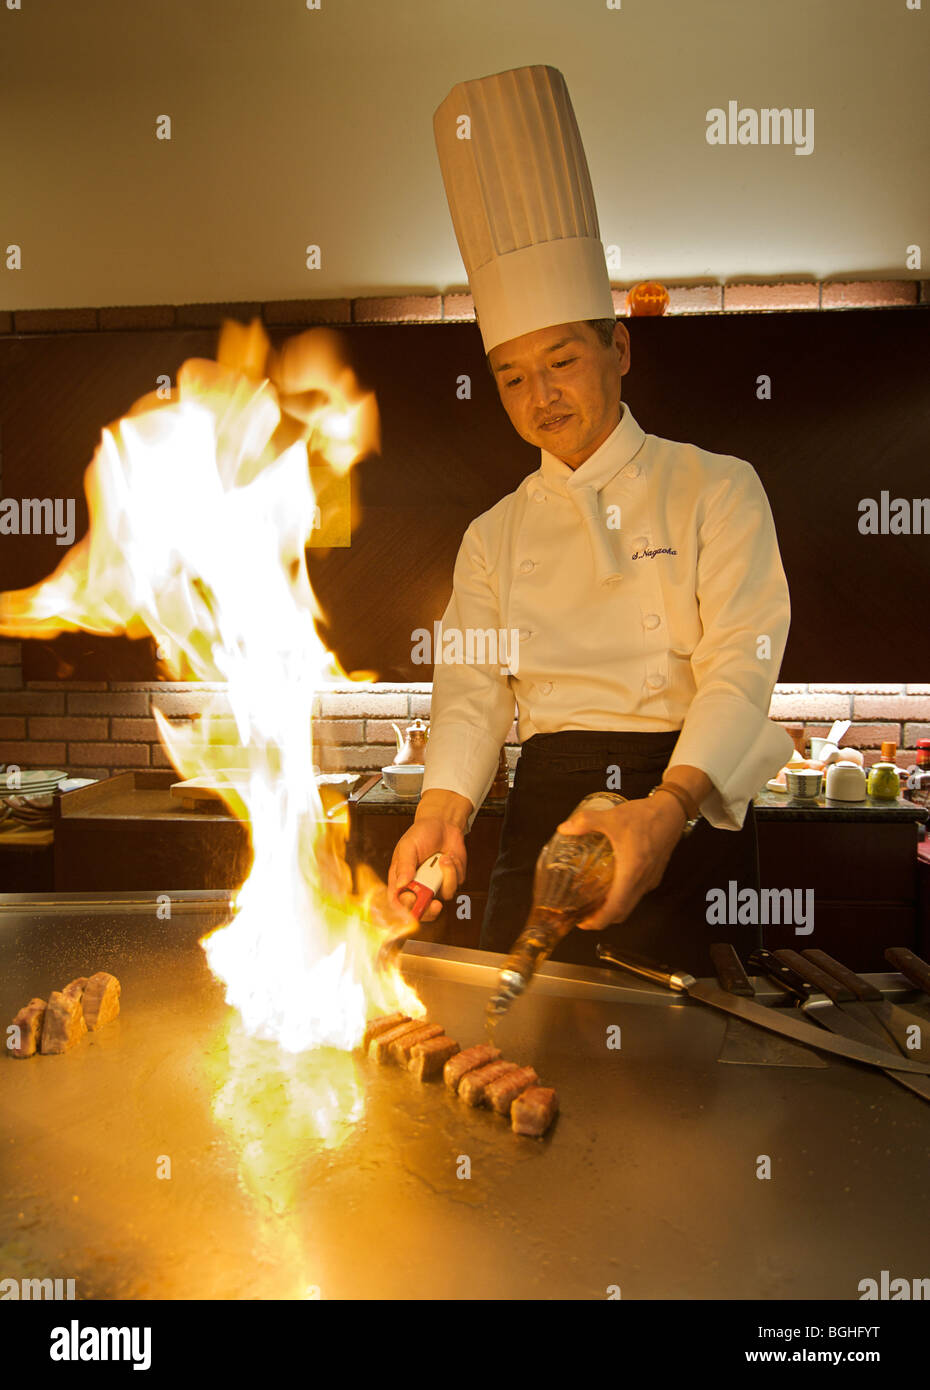 Nagaoka-san. Teppan esperto chef. Kyoto, Giappone Immagini Stock